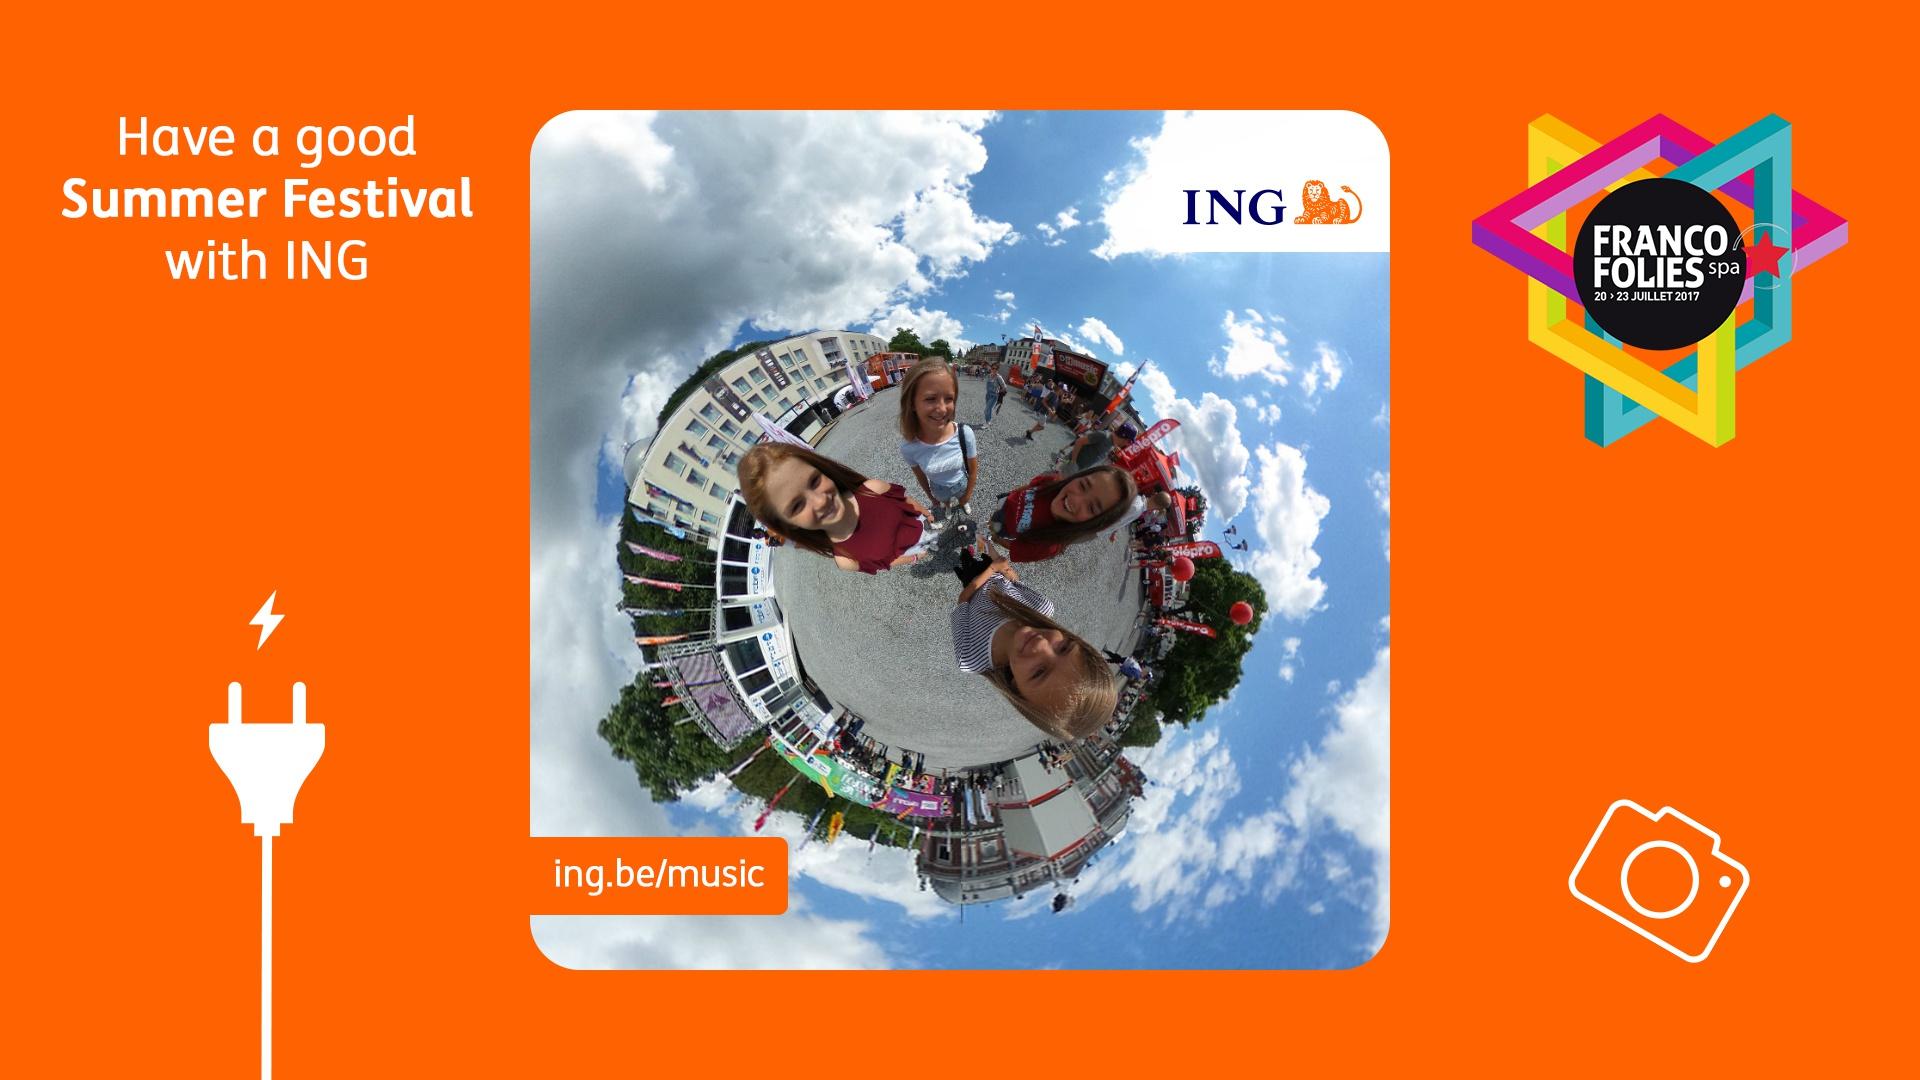 ING_Little-Planet_007.jpg